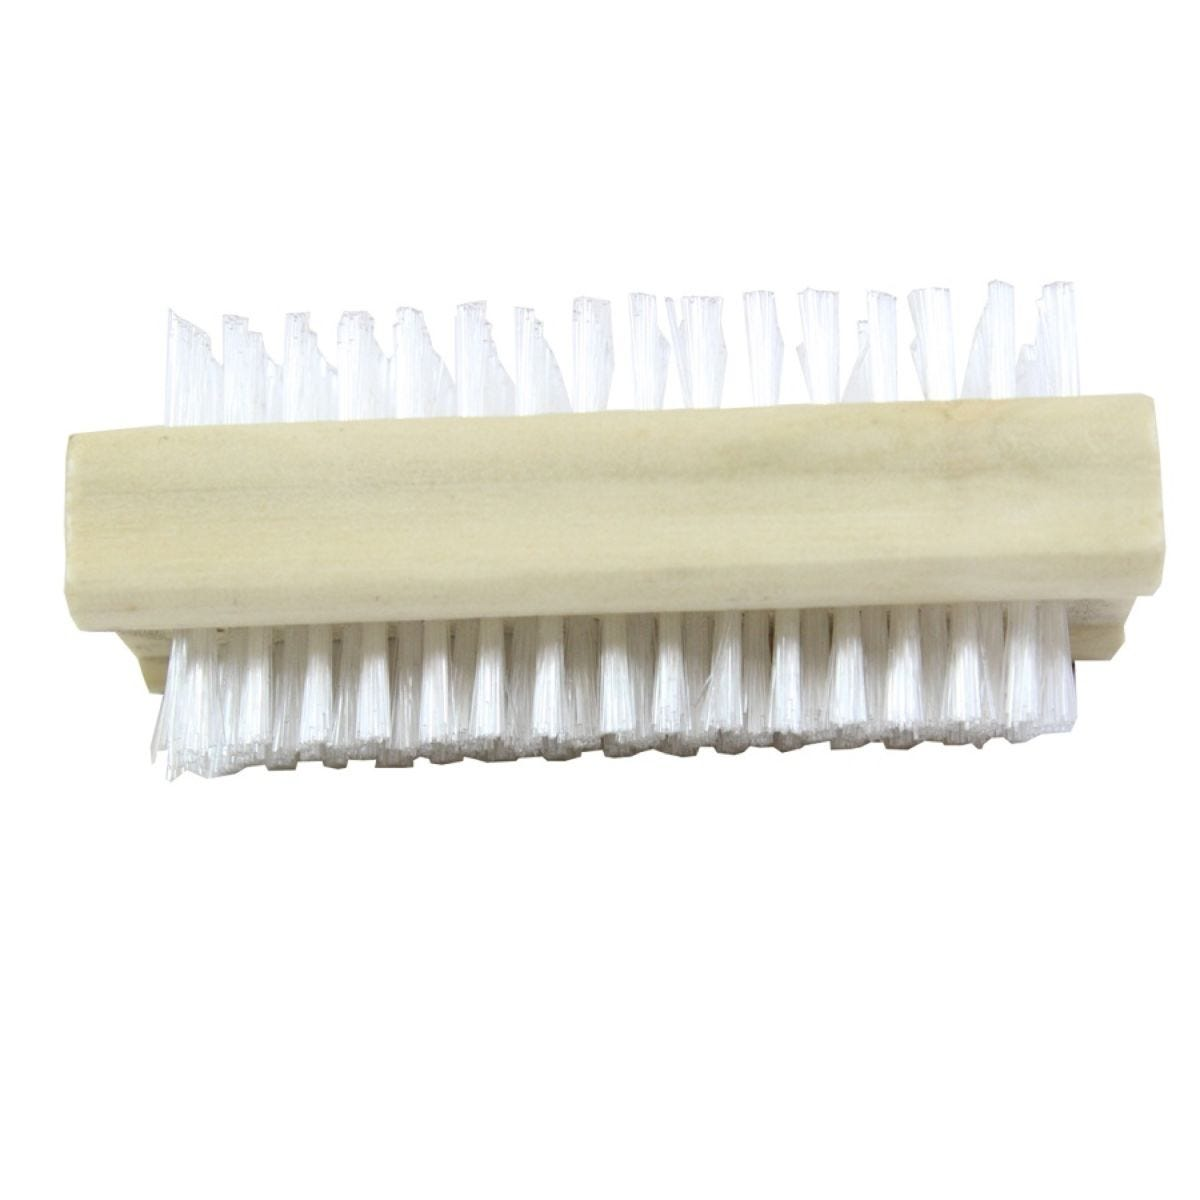 JVL Wooden Nail Brush